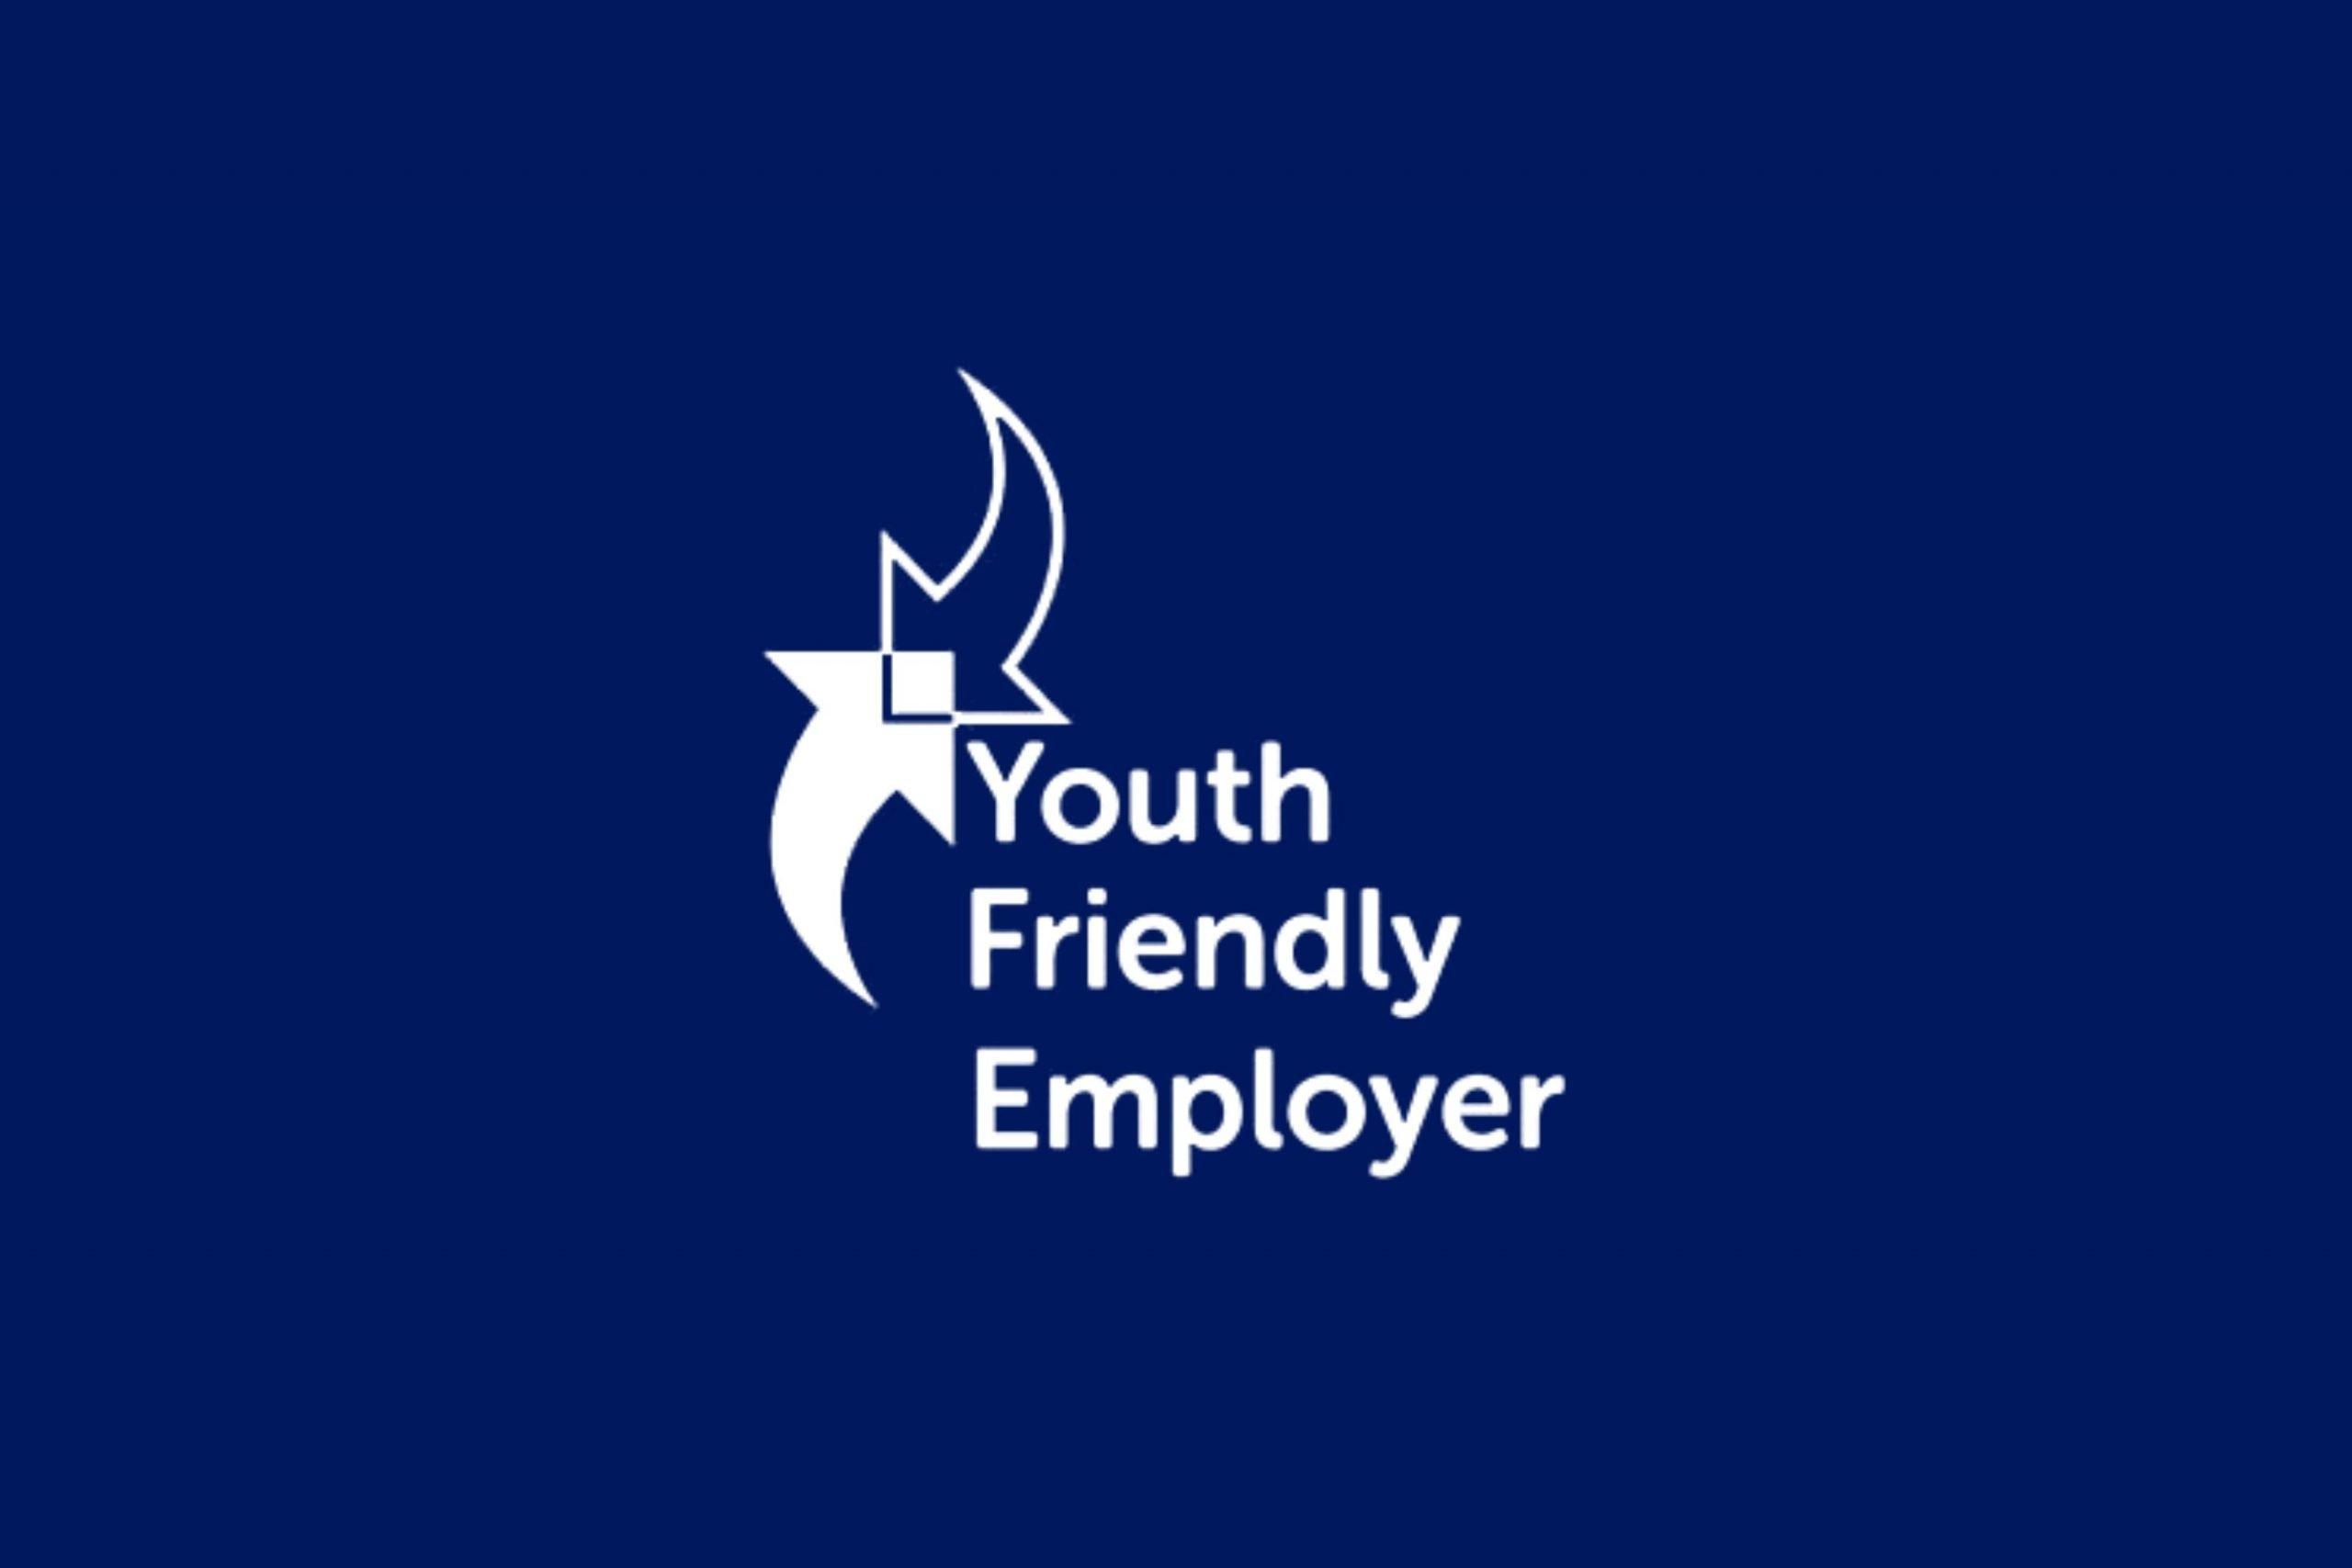 Youth Friendly Employer white logo on blue background